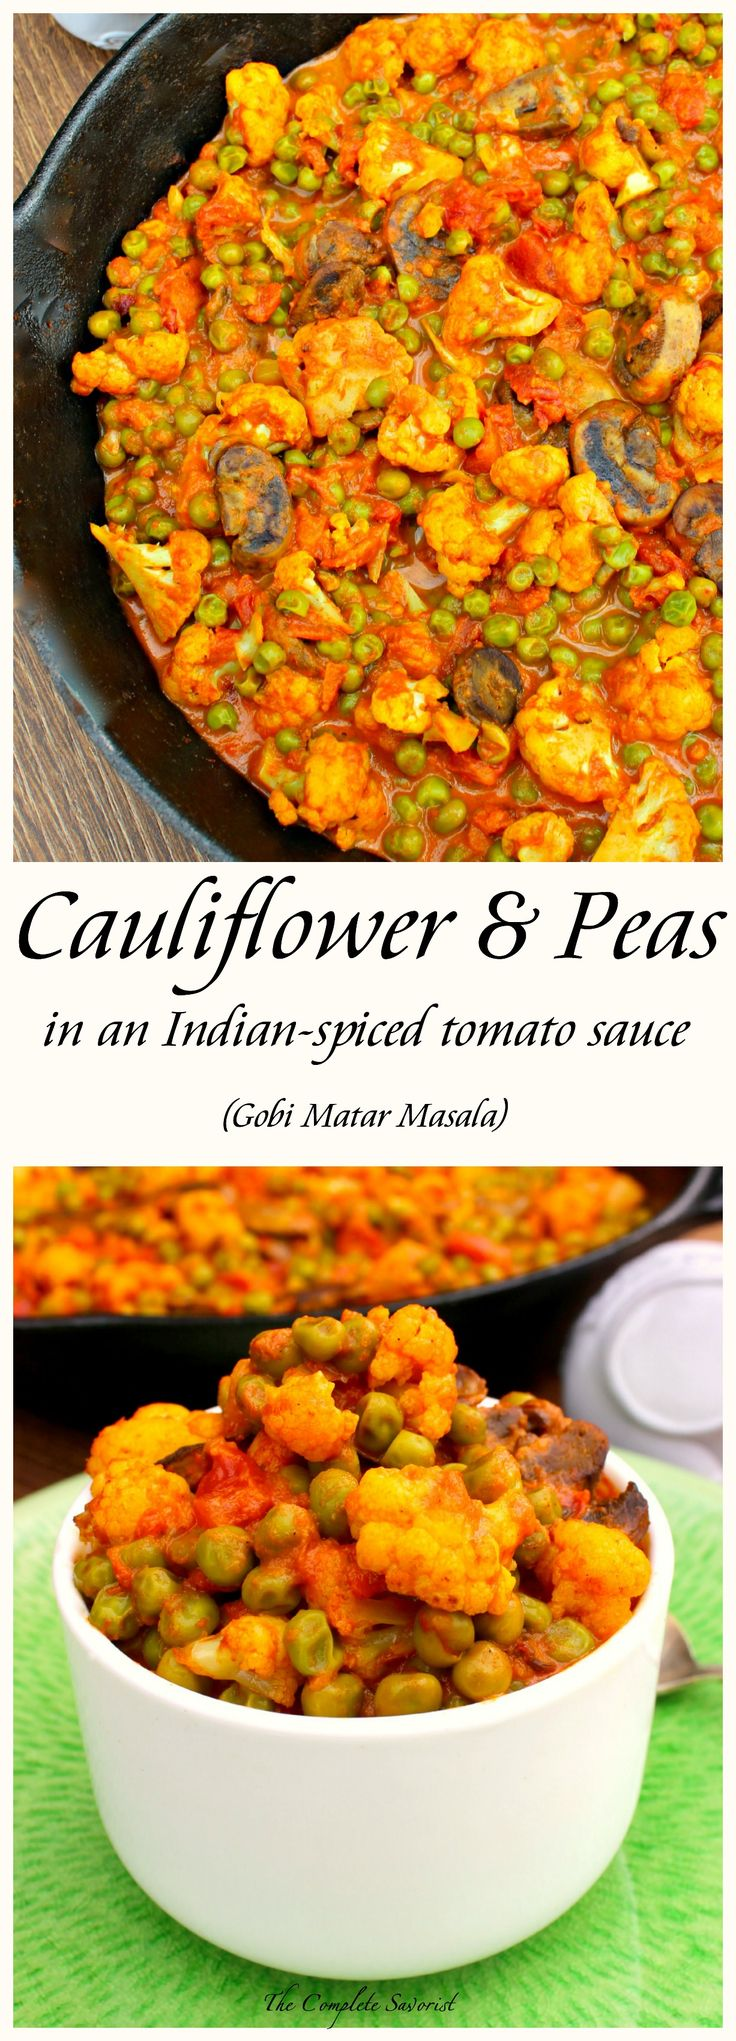 Best 25+ Cauliflower sabzi ideas on Pinterest